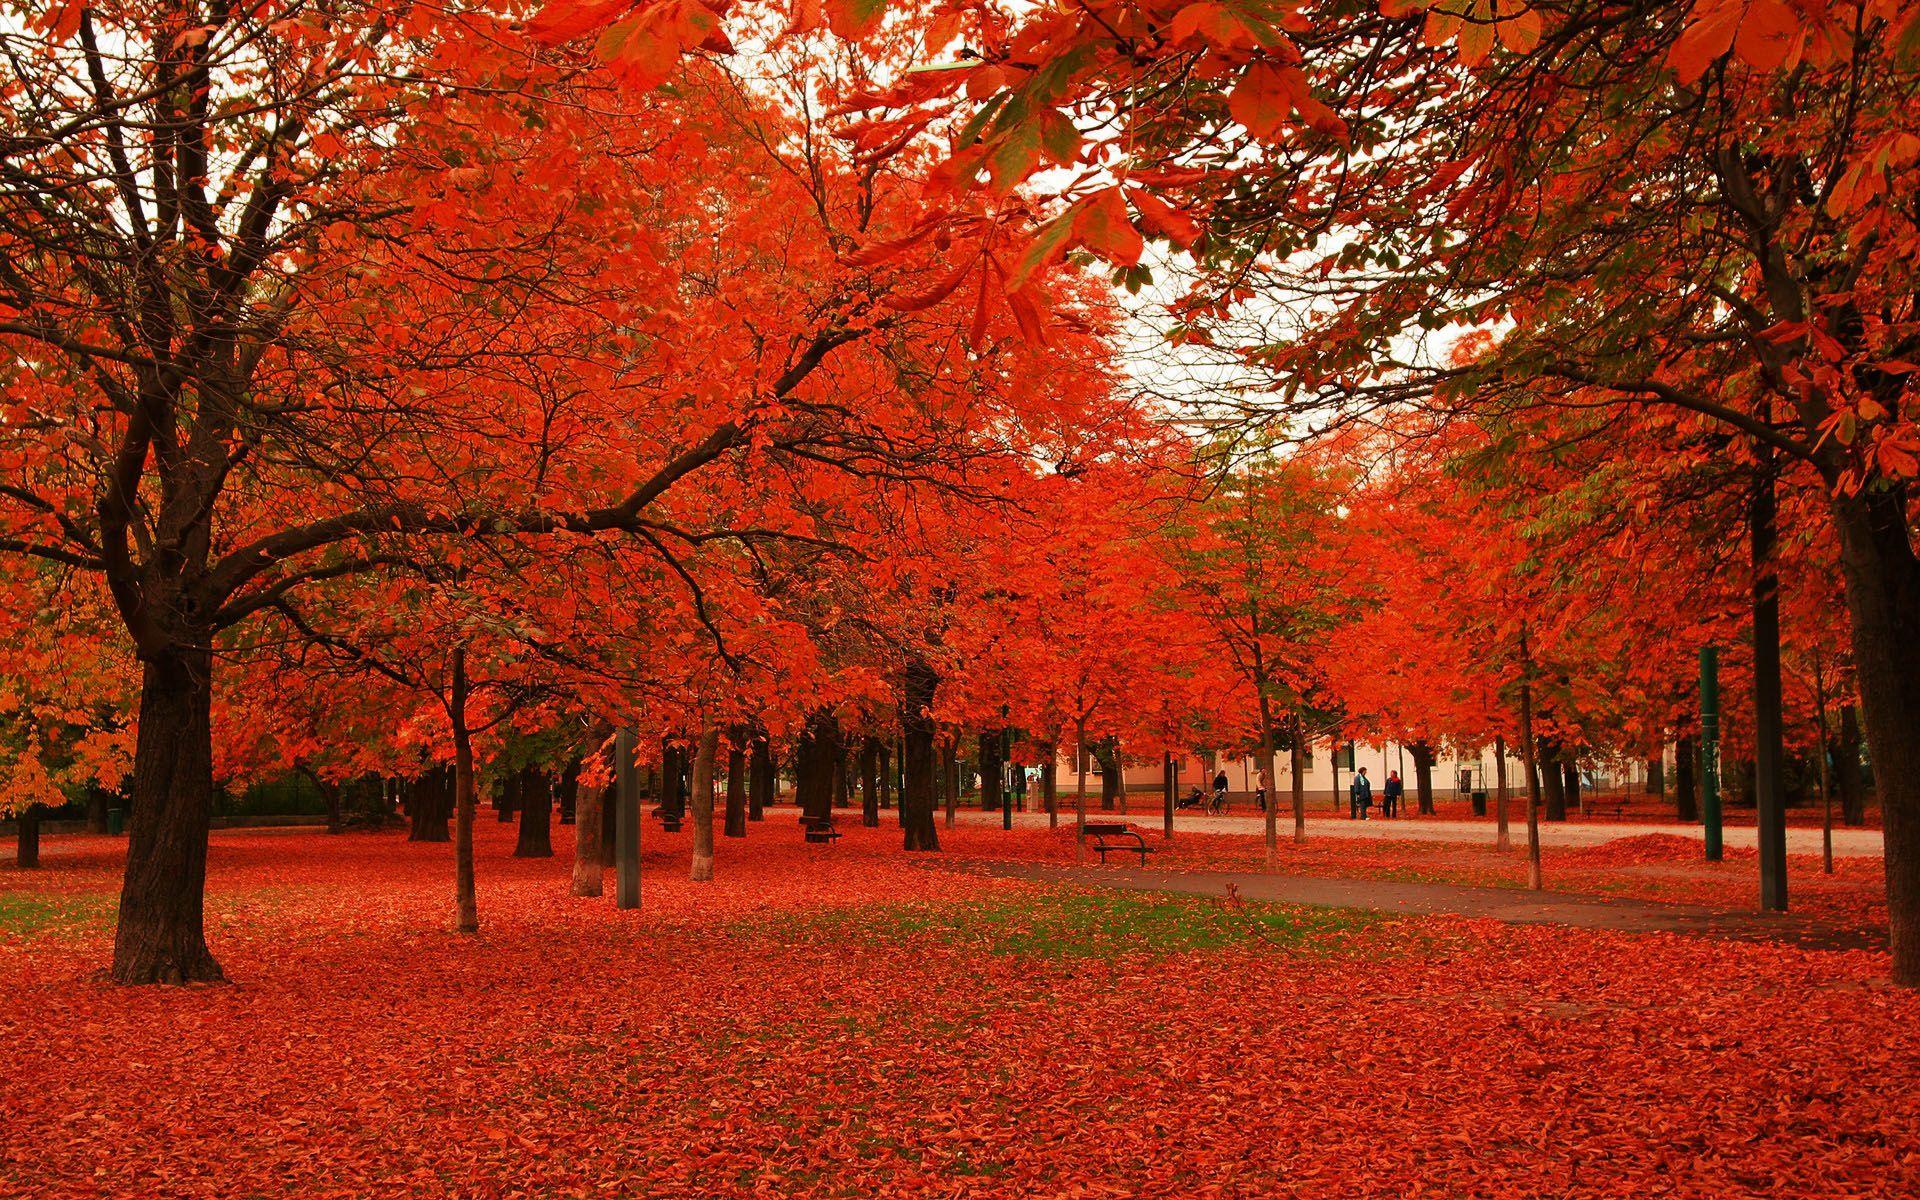 Fall Foliage Image Download Free Autumn Trees Beautiful Tree Nature Wallpaper